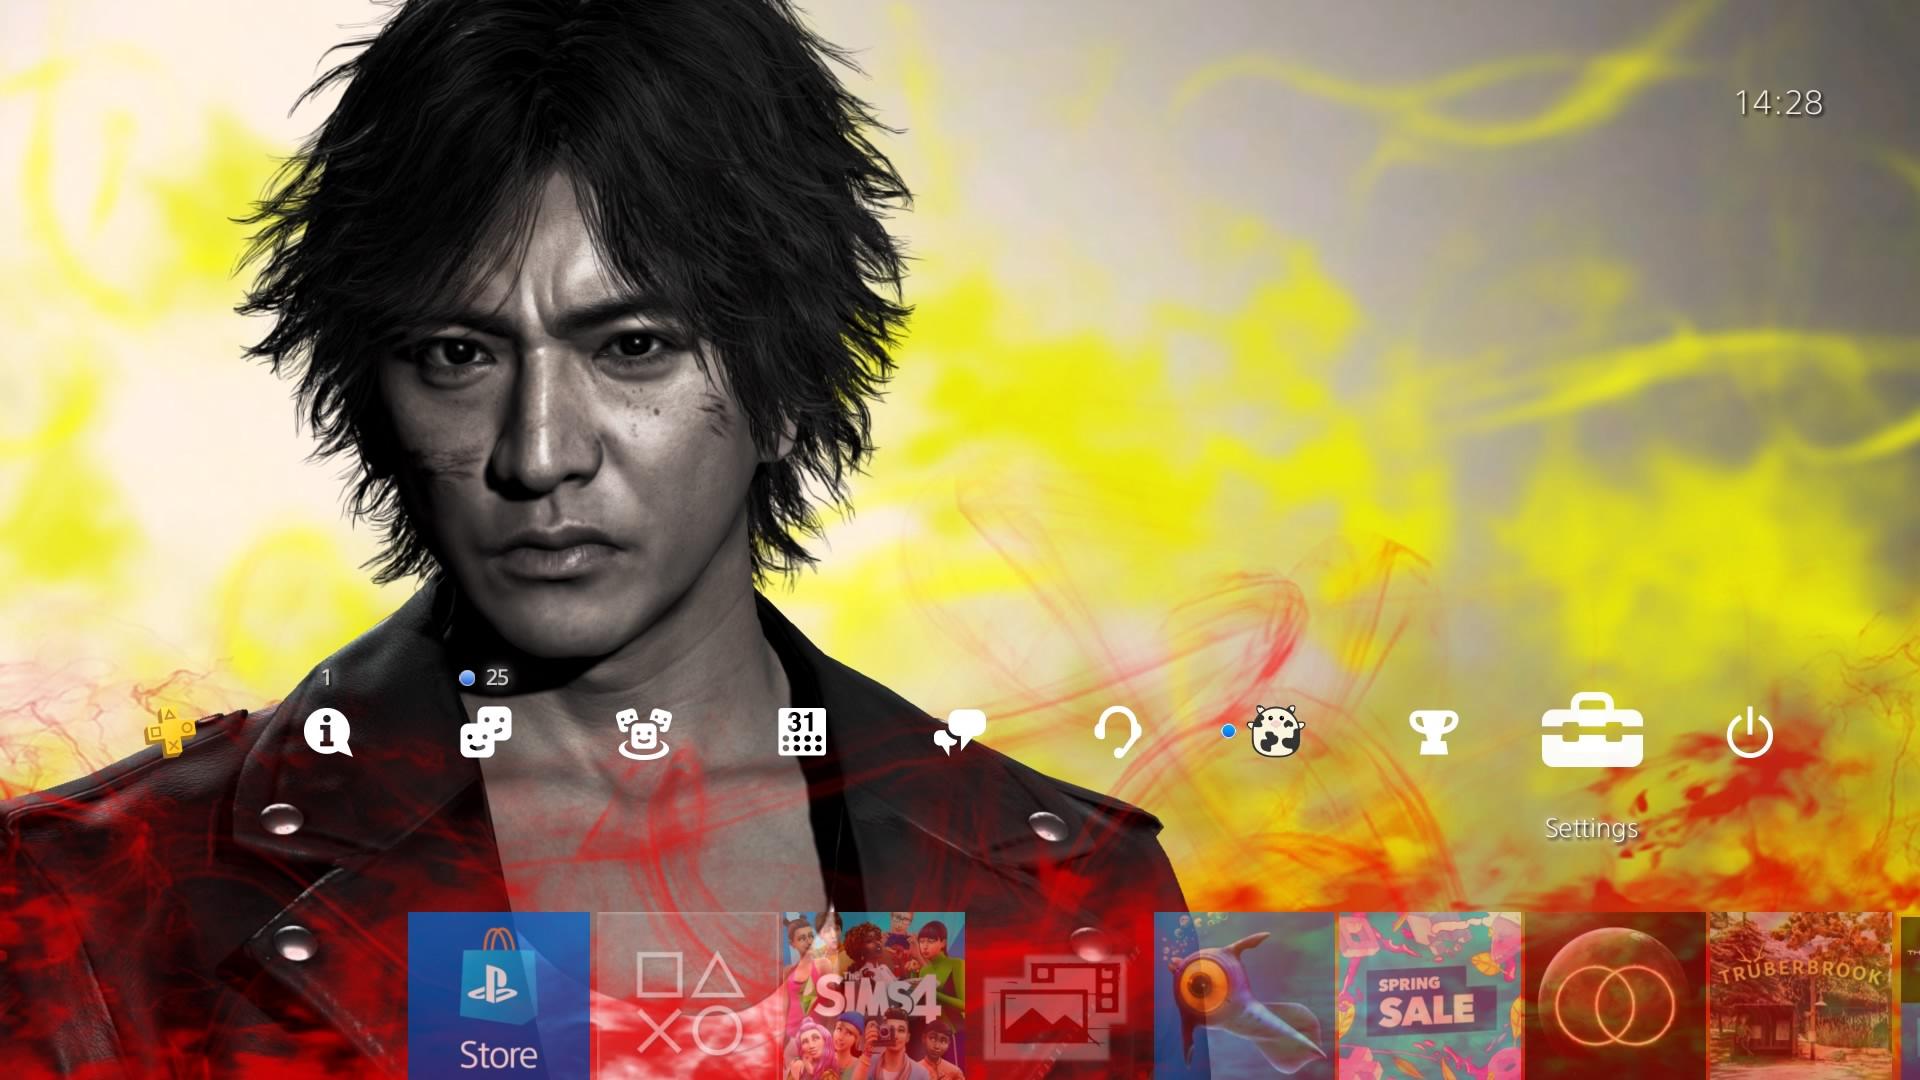 judgement dynamic theme.original - PlayStation 4 - Guida: i migliori temi gratuiti da scaricare